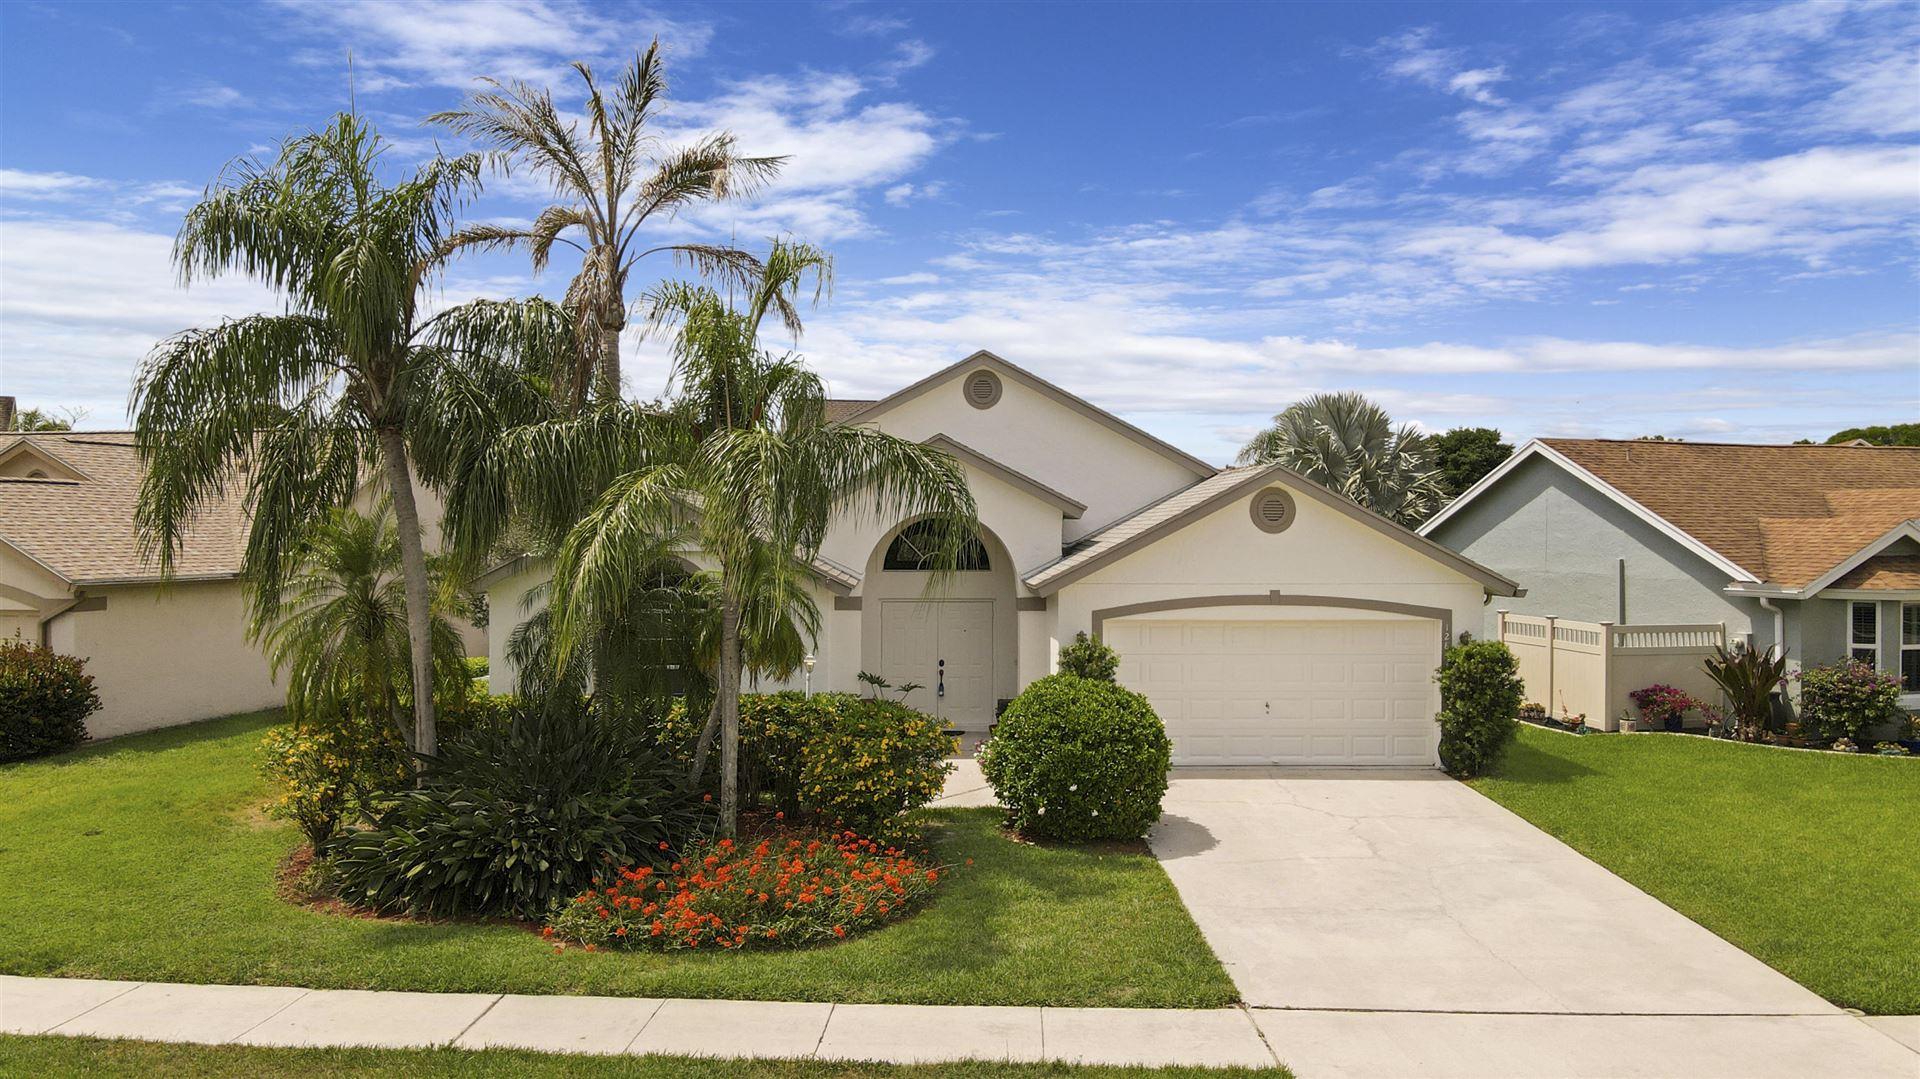 12833 Meadowbreeze Drive, Wellington, FL 33414 - MLS#: RX-10706419